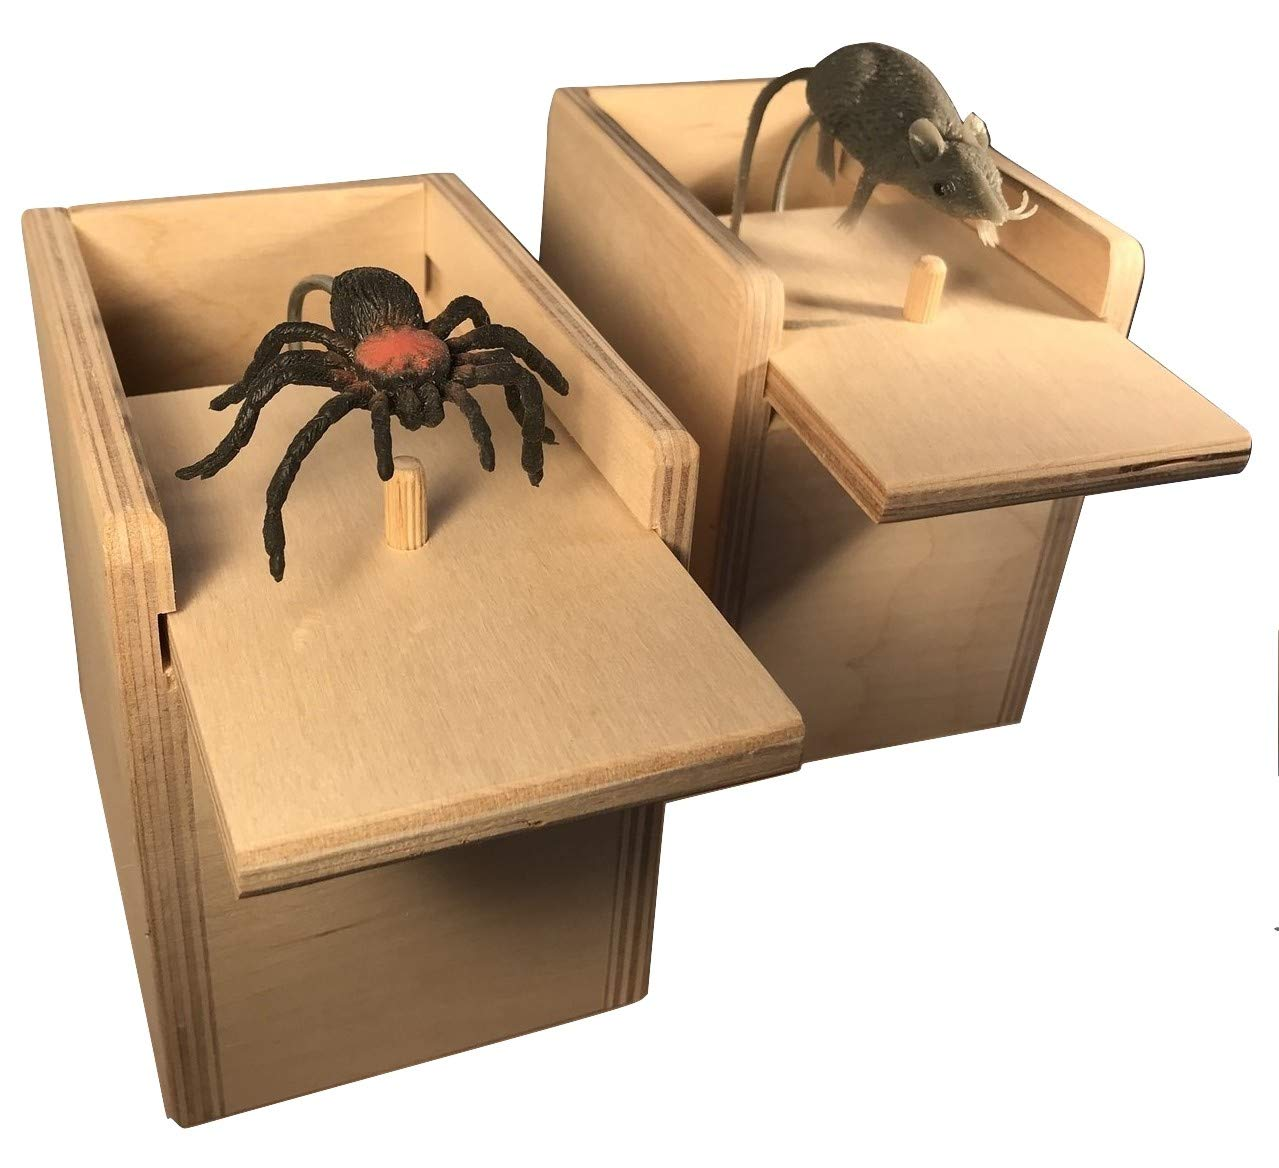 Saving Shepherd Mouse & Spider Surprise Box ~ 2 USA Handmade Fun Prank Gag Gifts